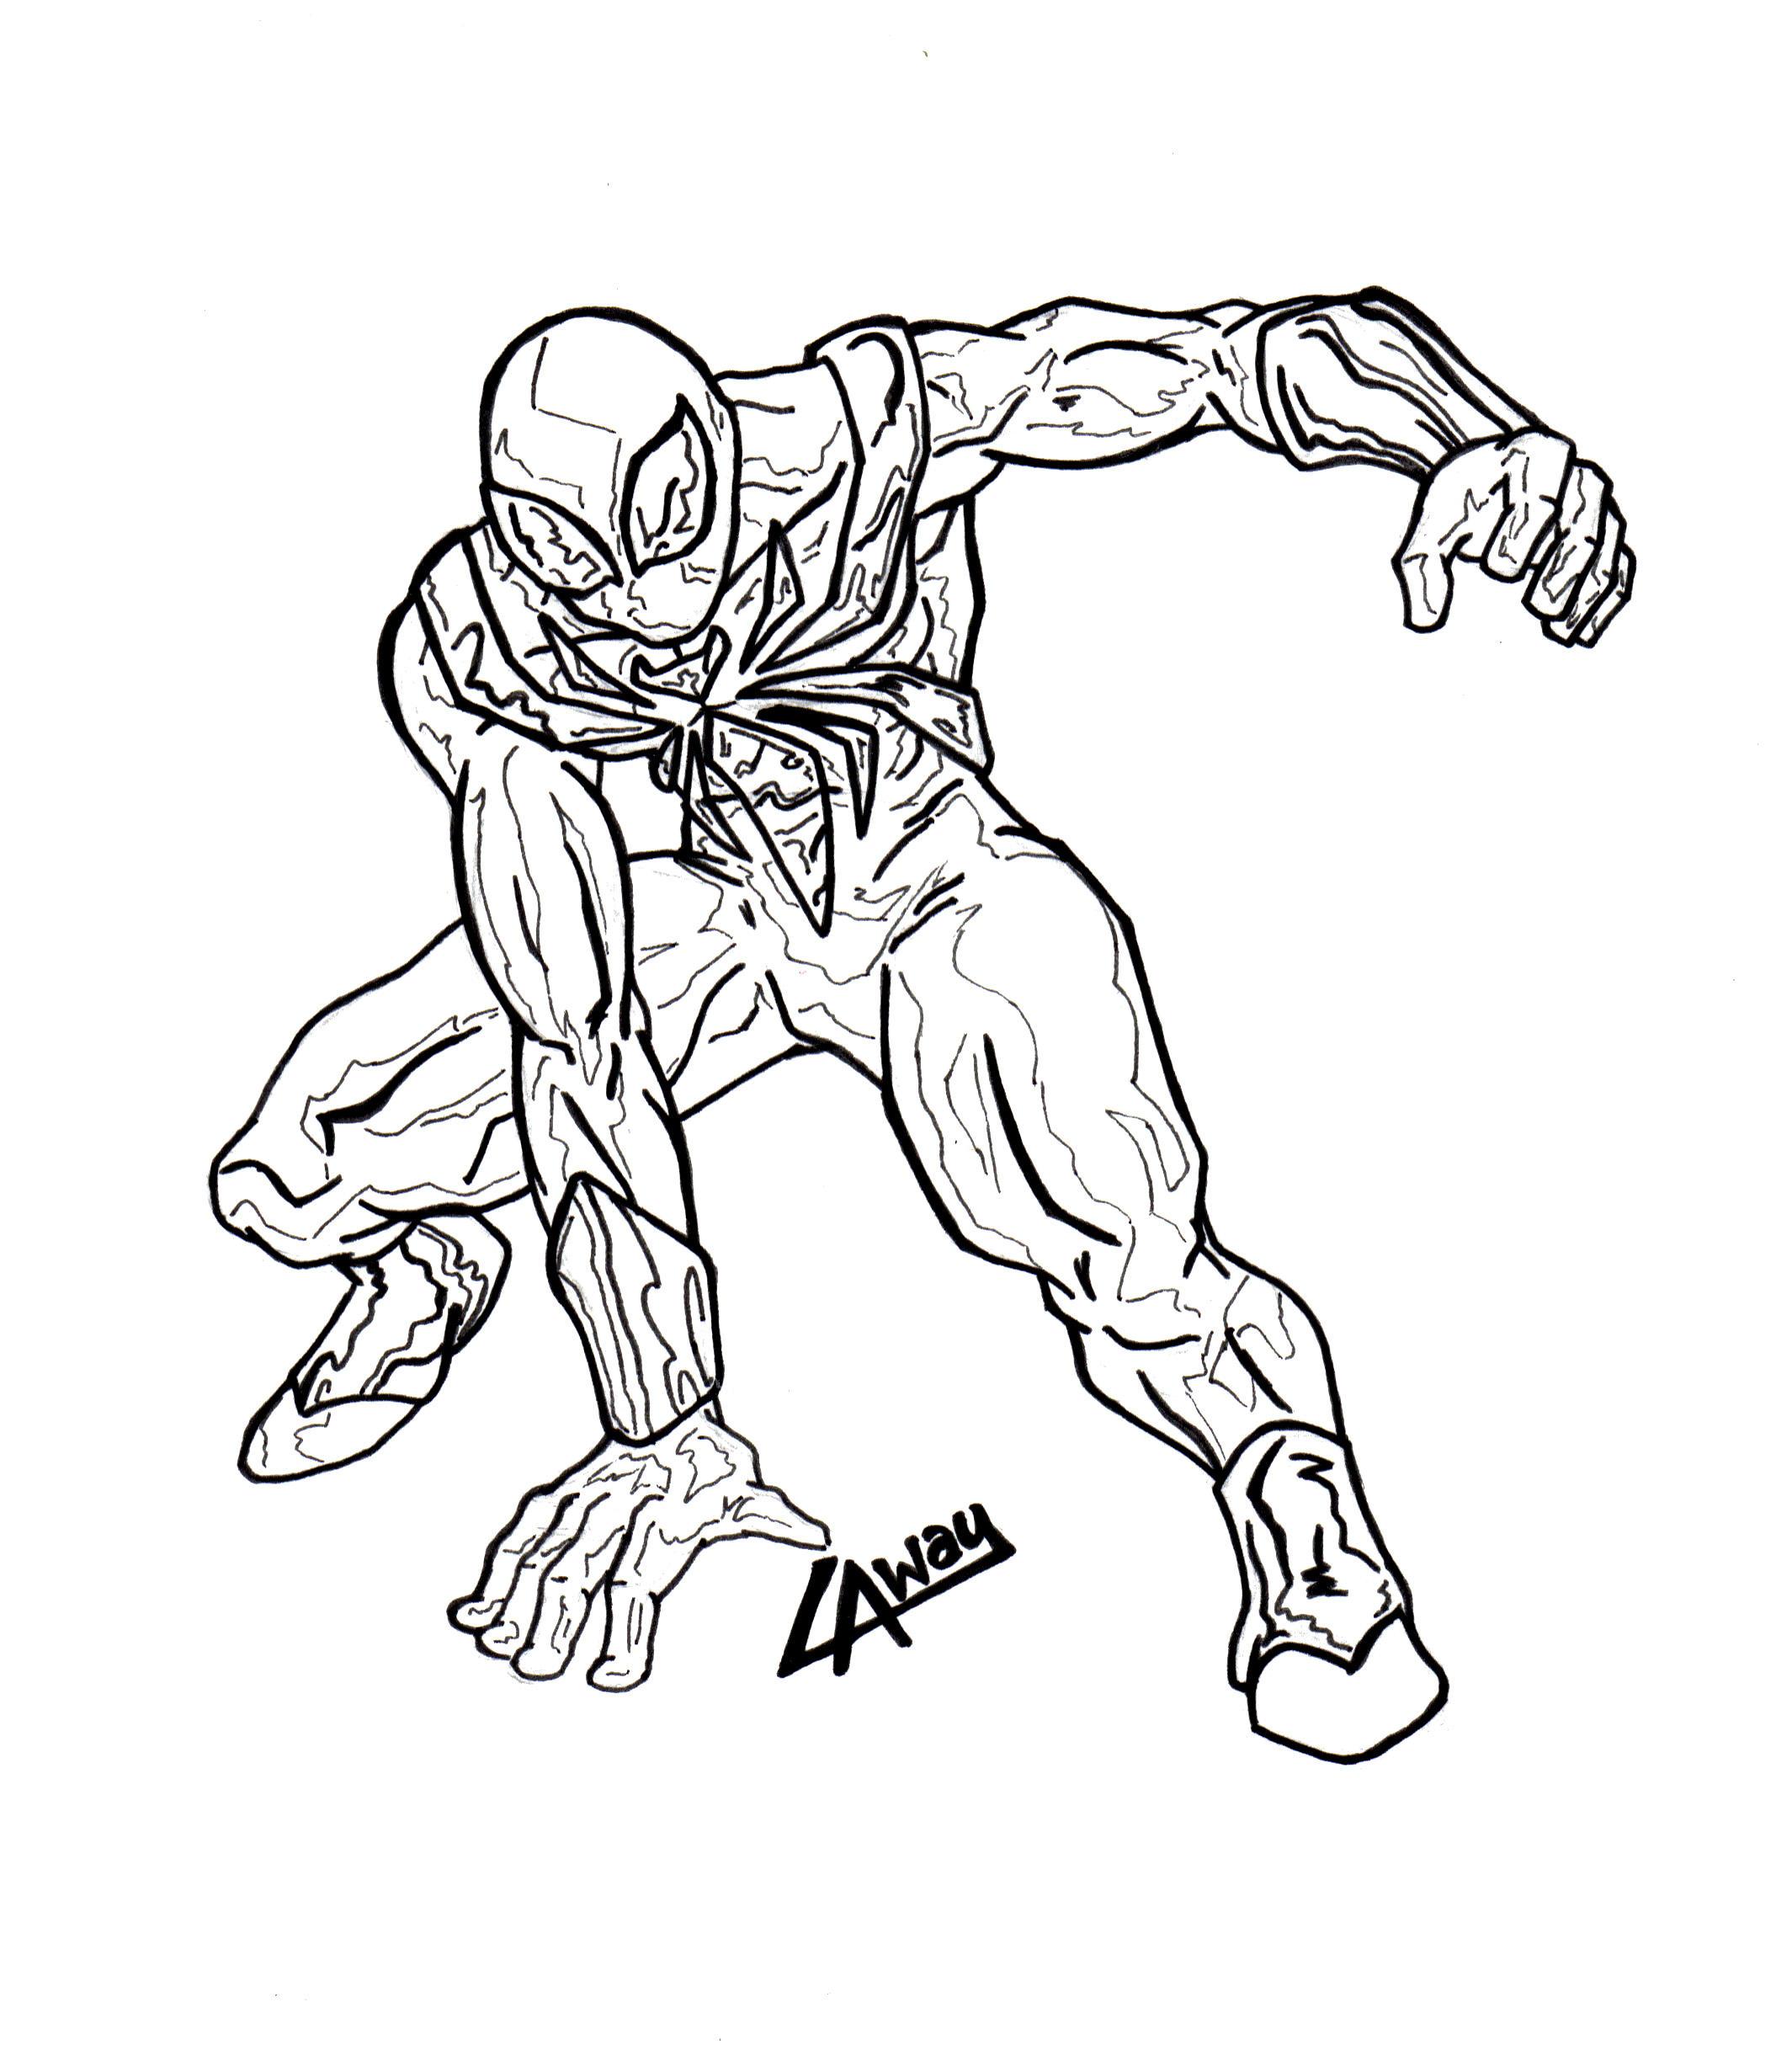 Iron Spiderman Inked by AngelCrusher on DeviantArt